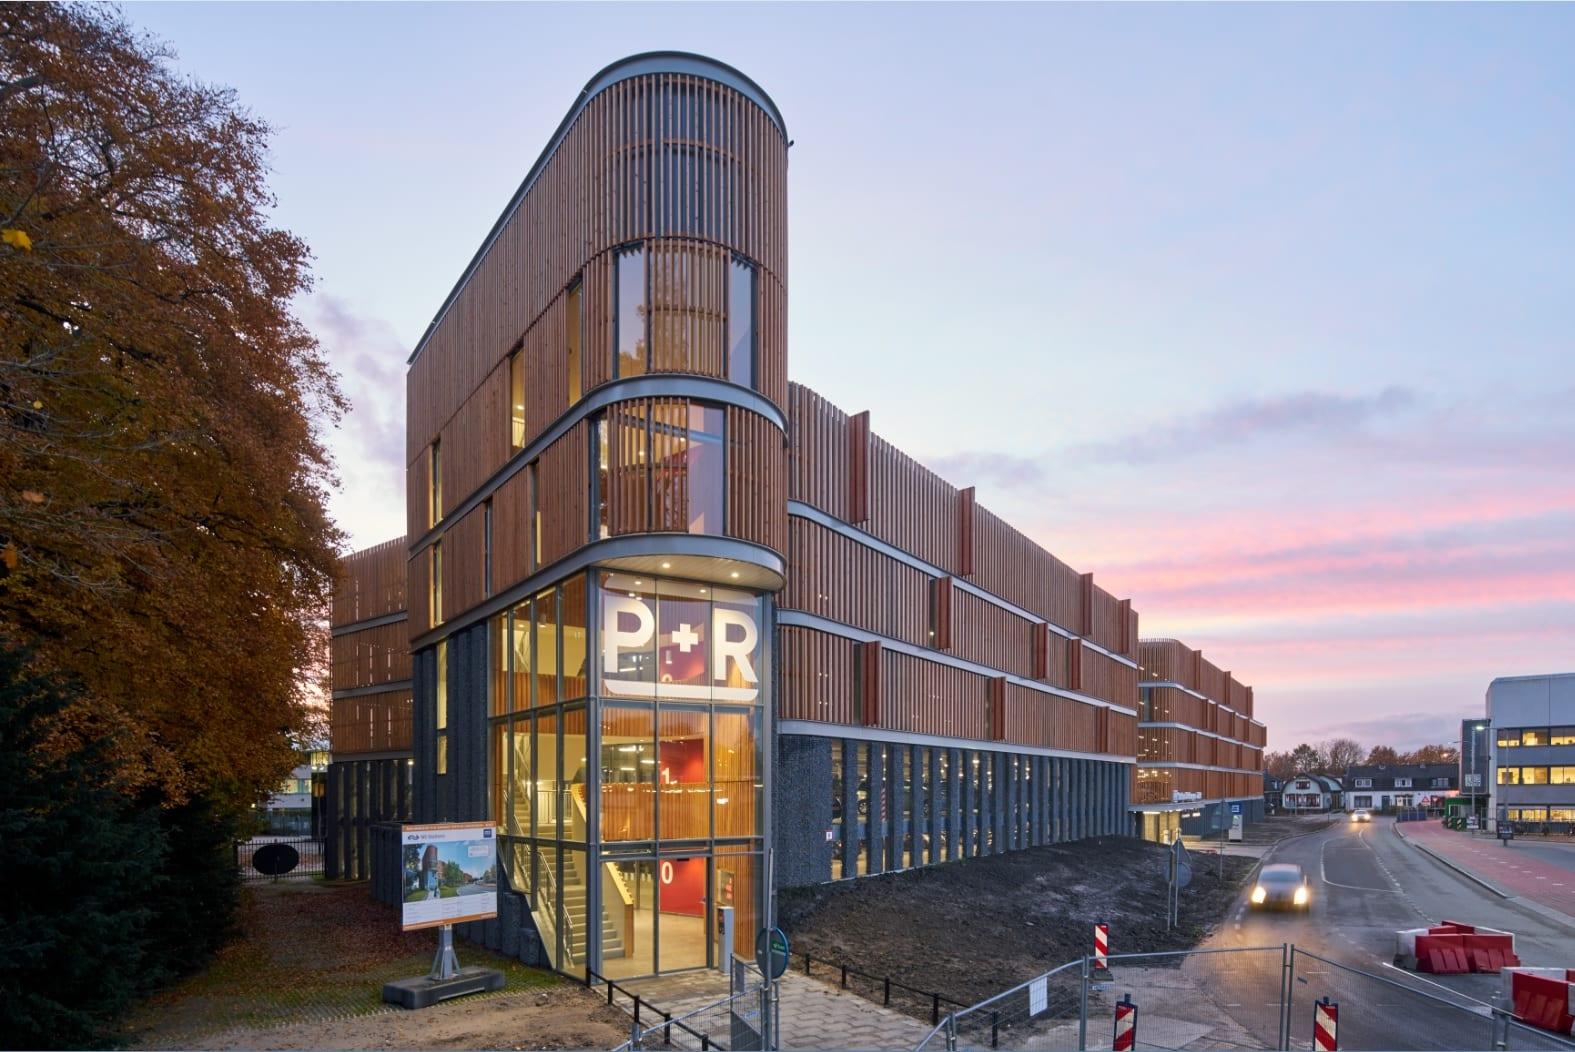 Energieneutrale parkeergarage Driebergen-Zeist-René de Wit